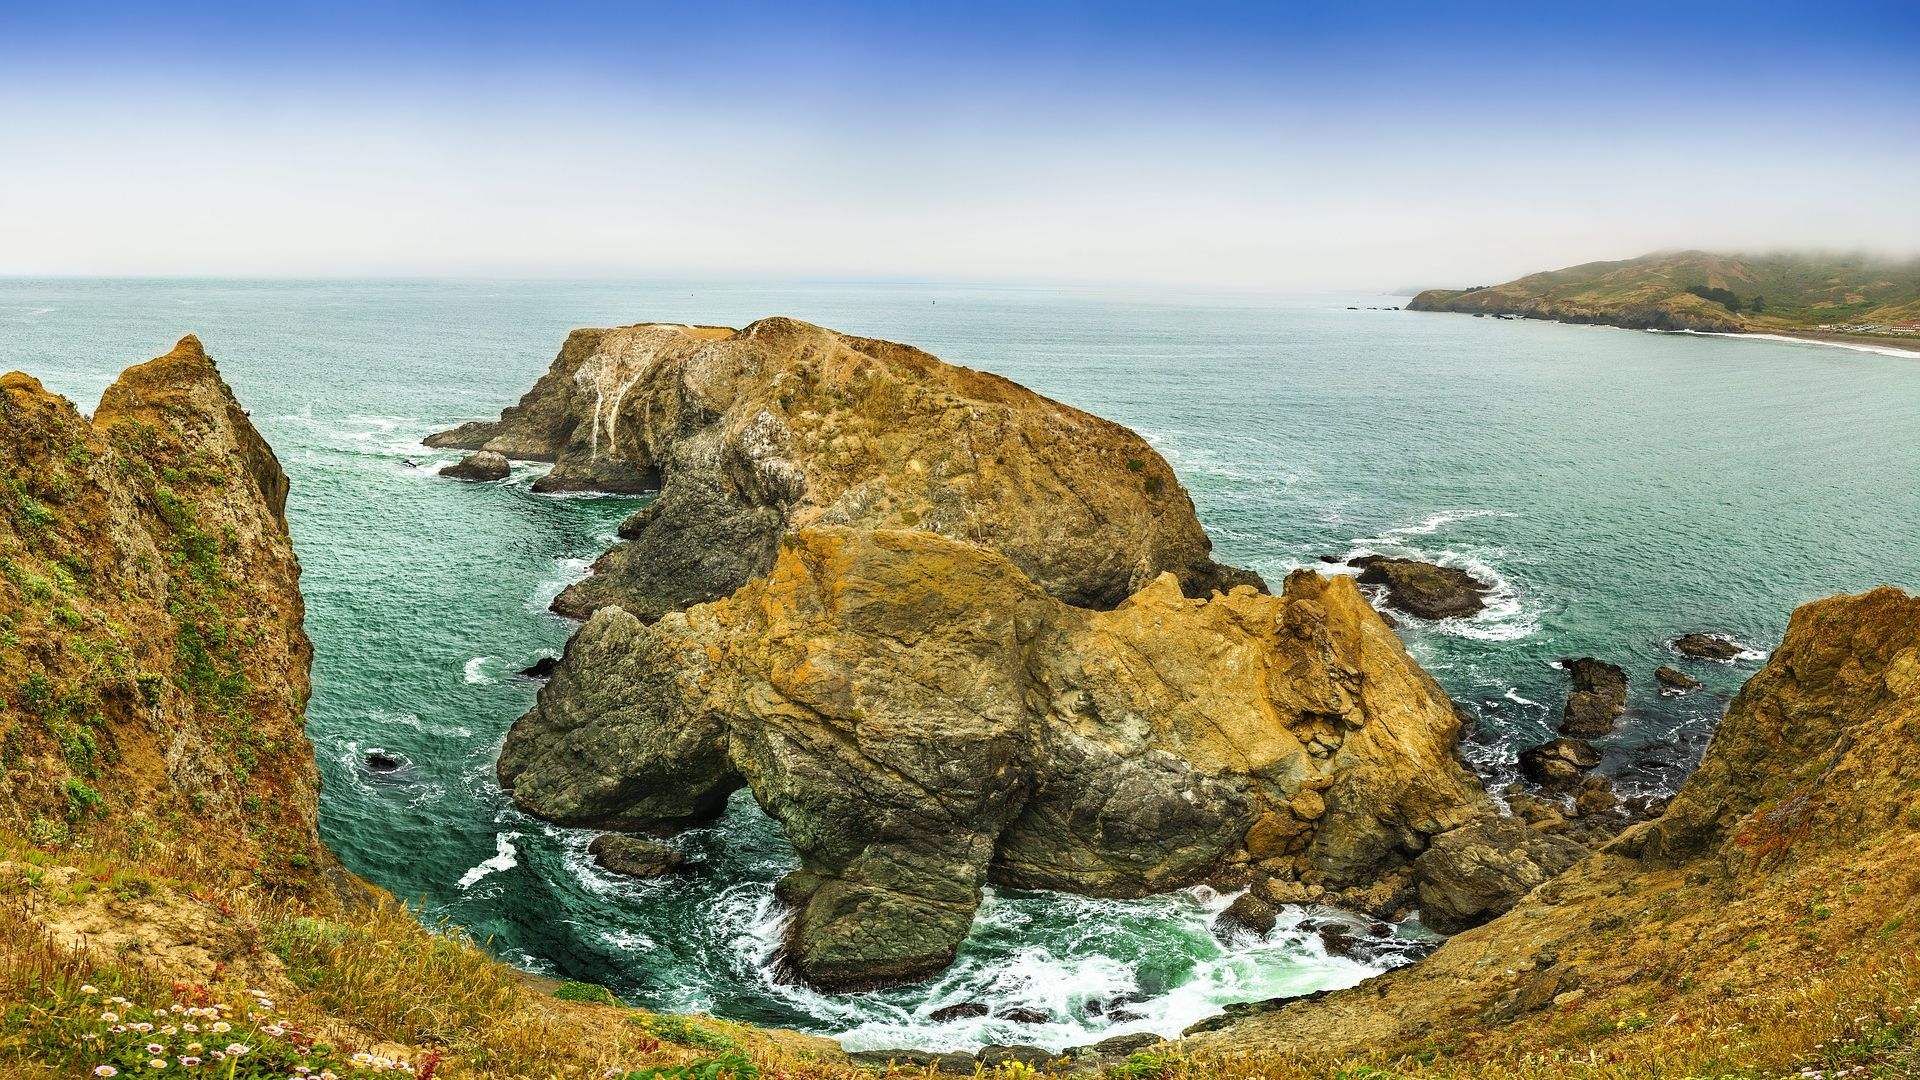 Wallpaper Ocean, beach, nature, rocky shore